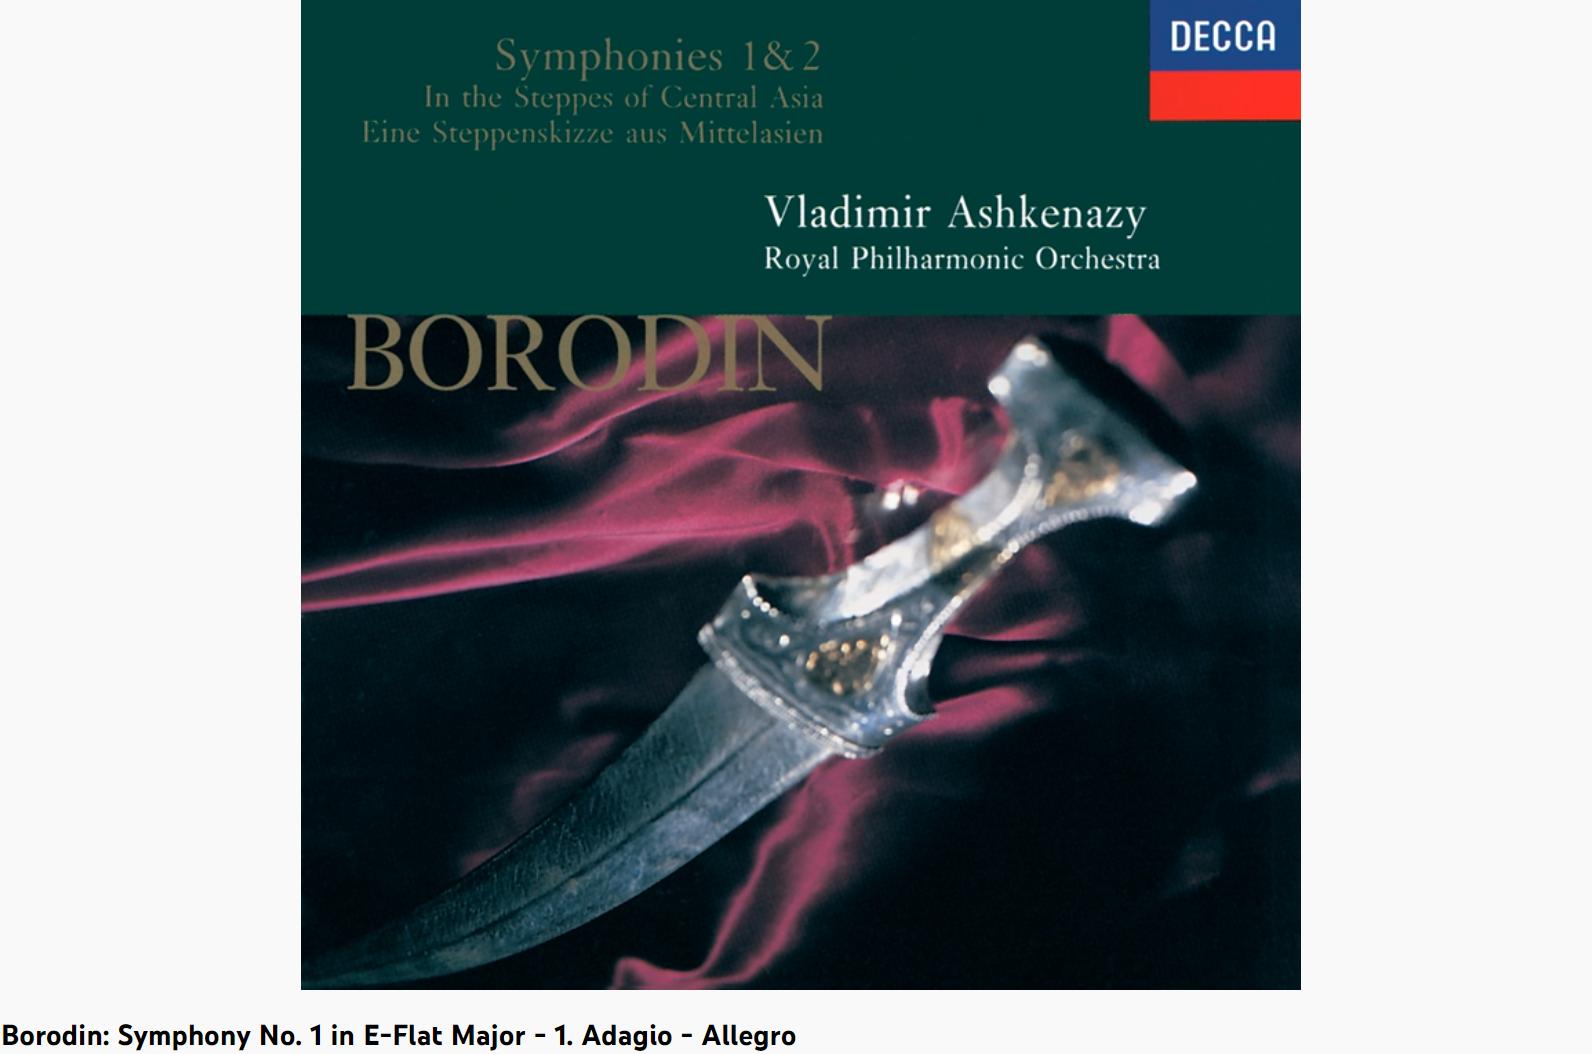 Borodine Symphonie n° 1 adagio